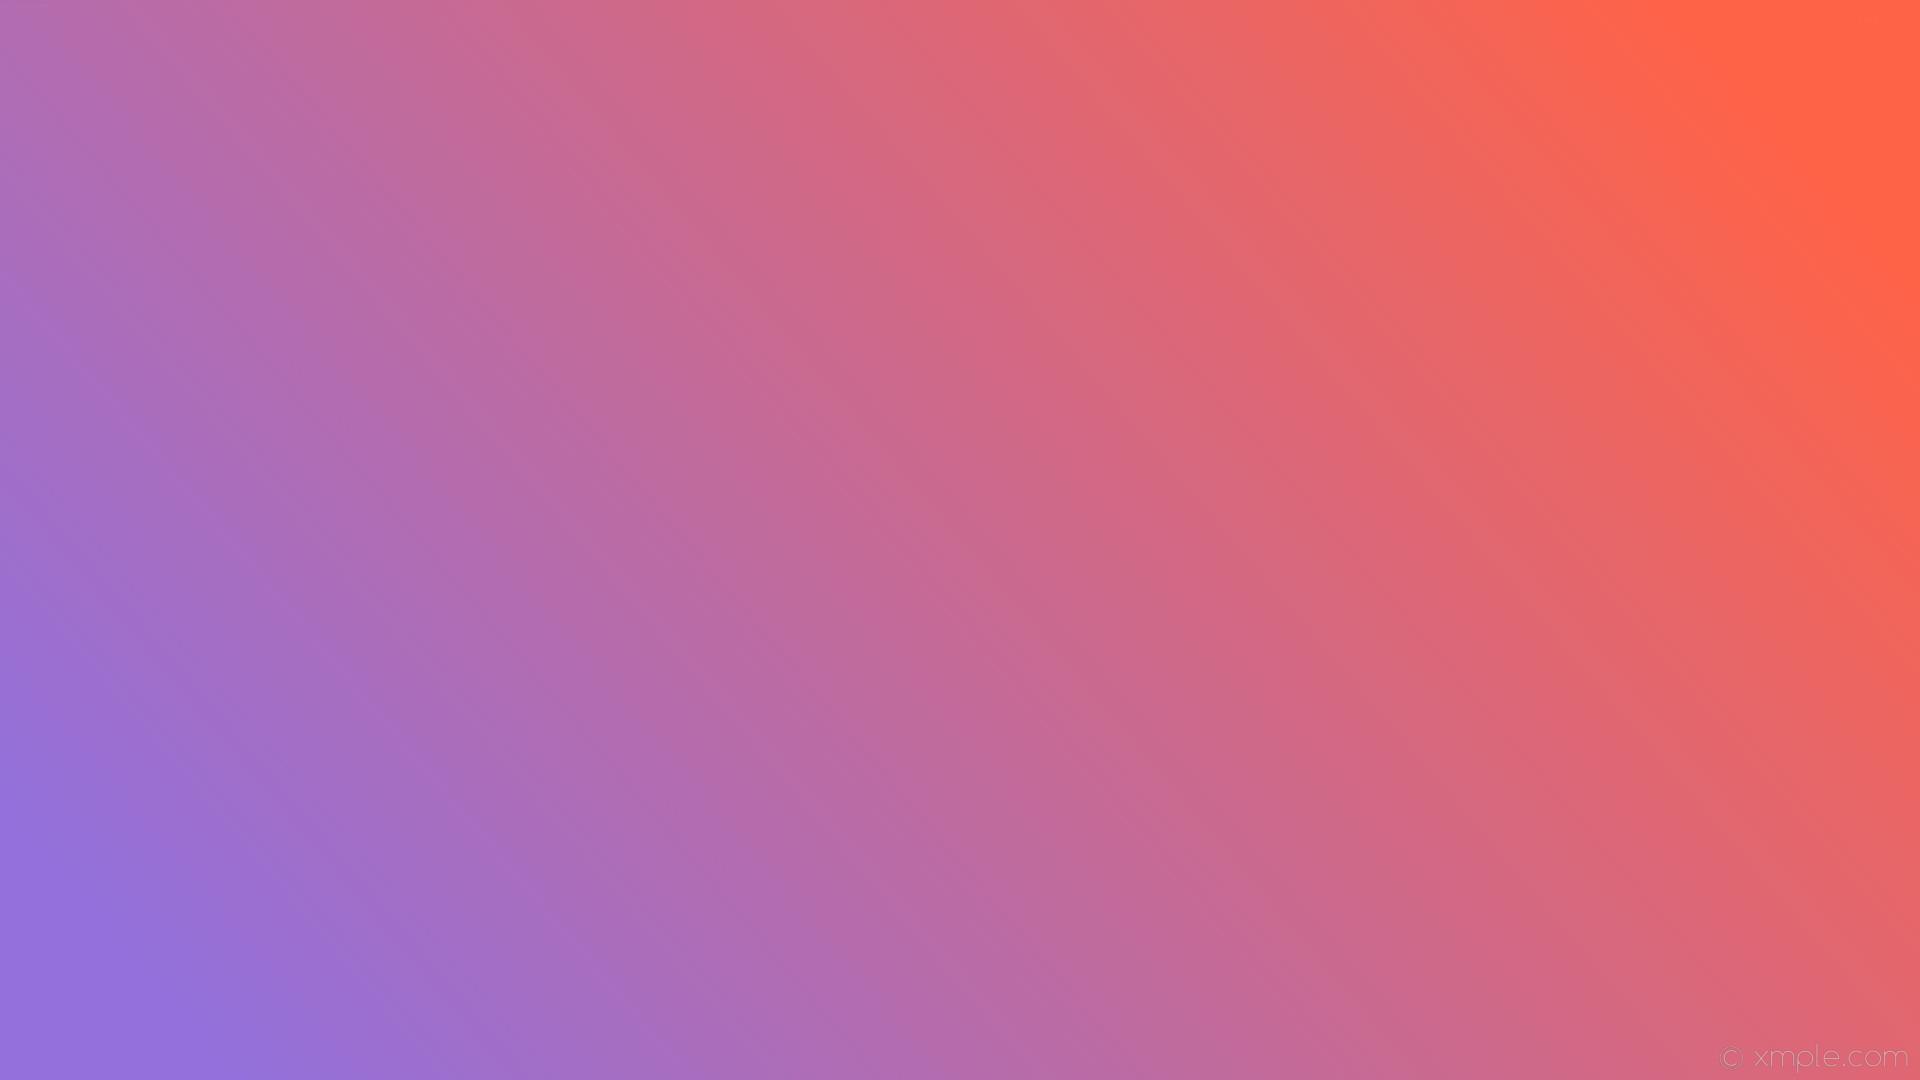 wallpaper purple orange gradient linear tomato medium purple #ff6347  #9370db 15°